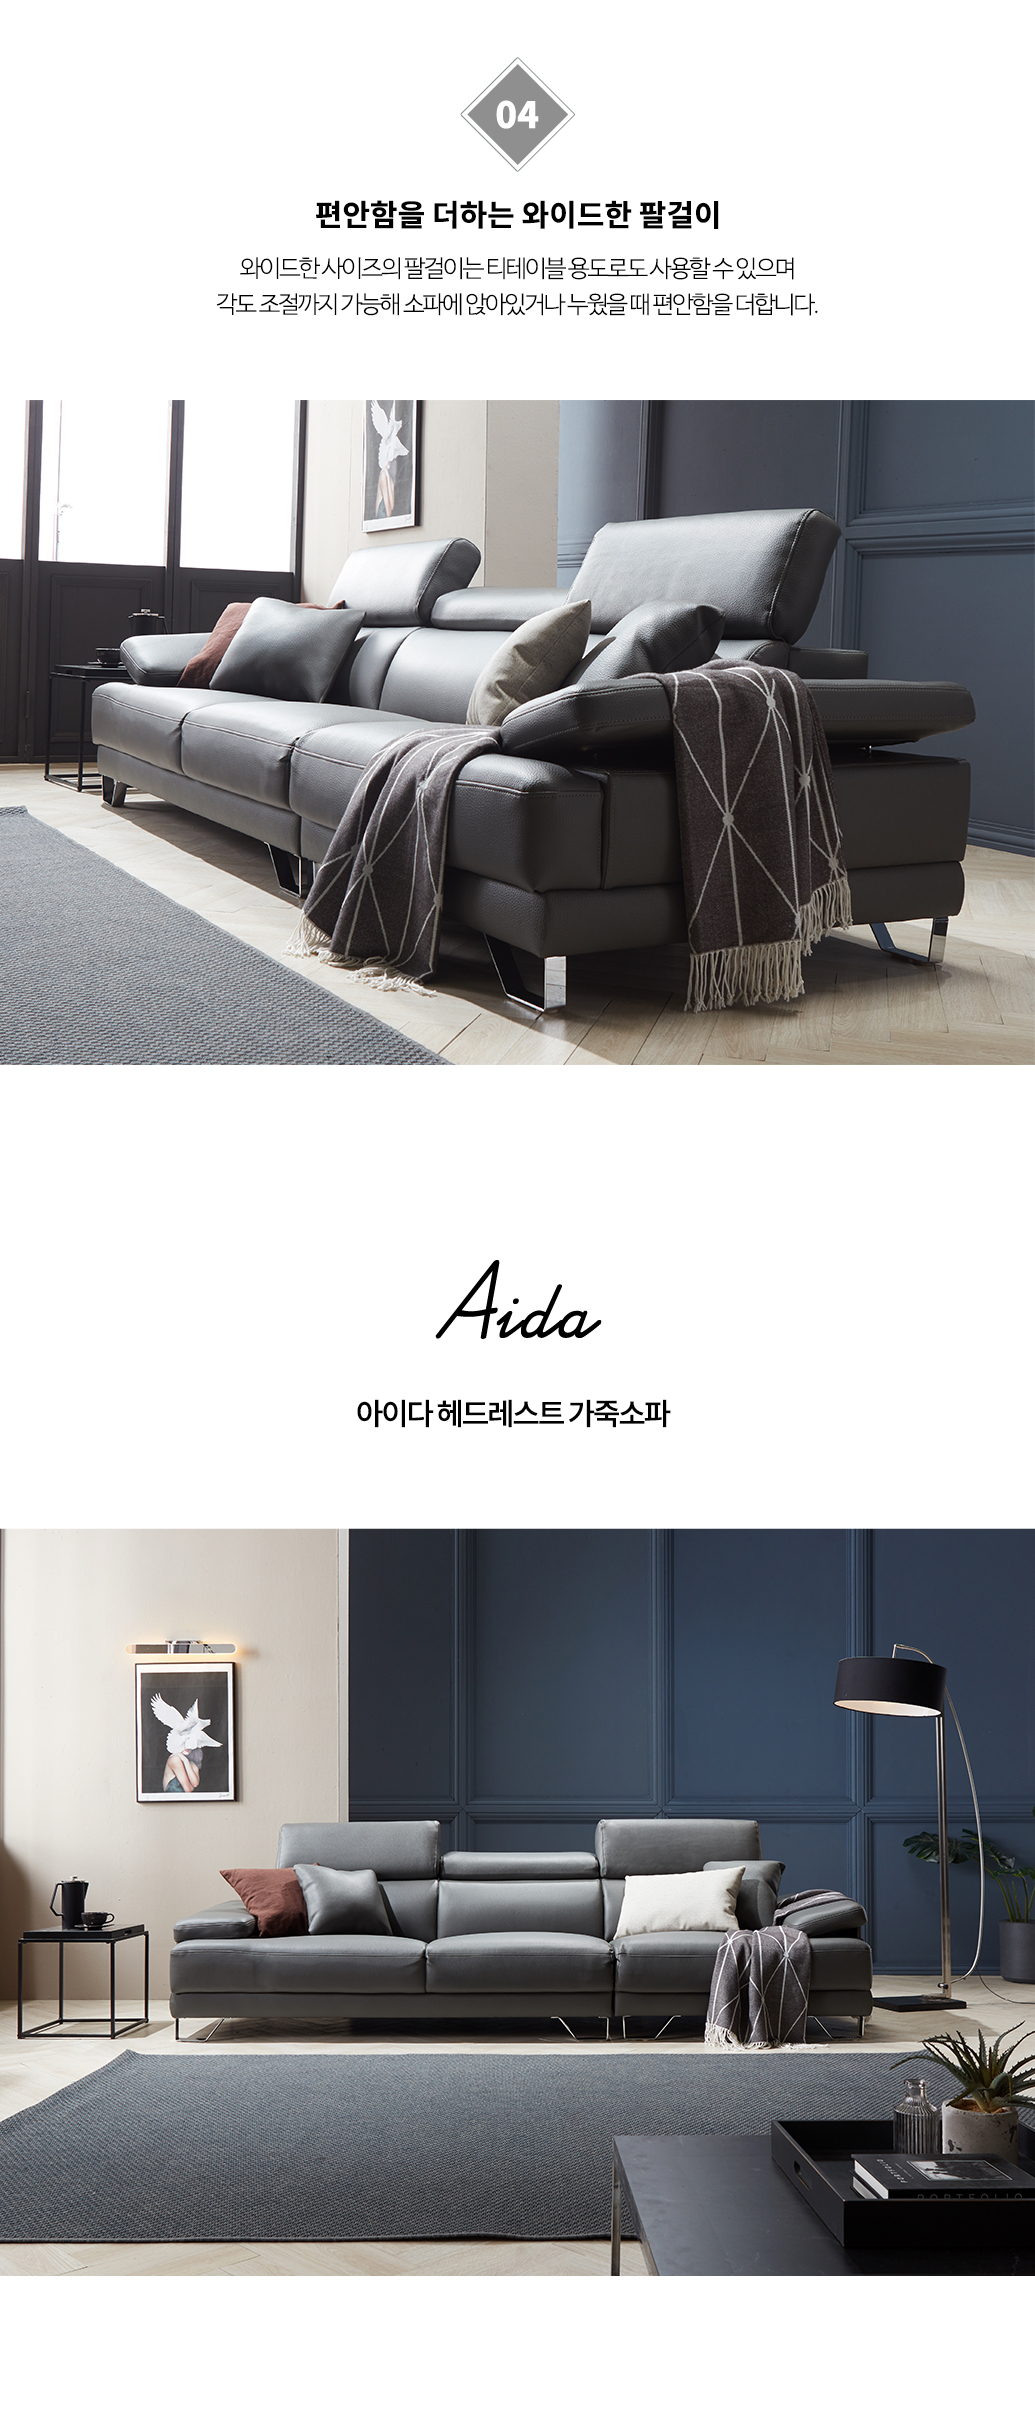 aida_07.jpg